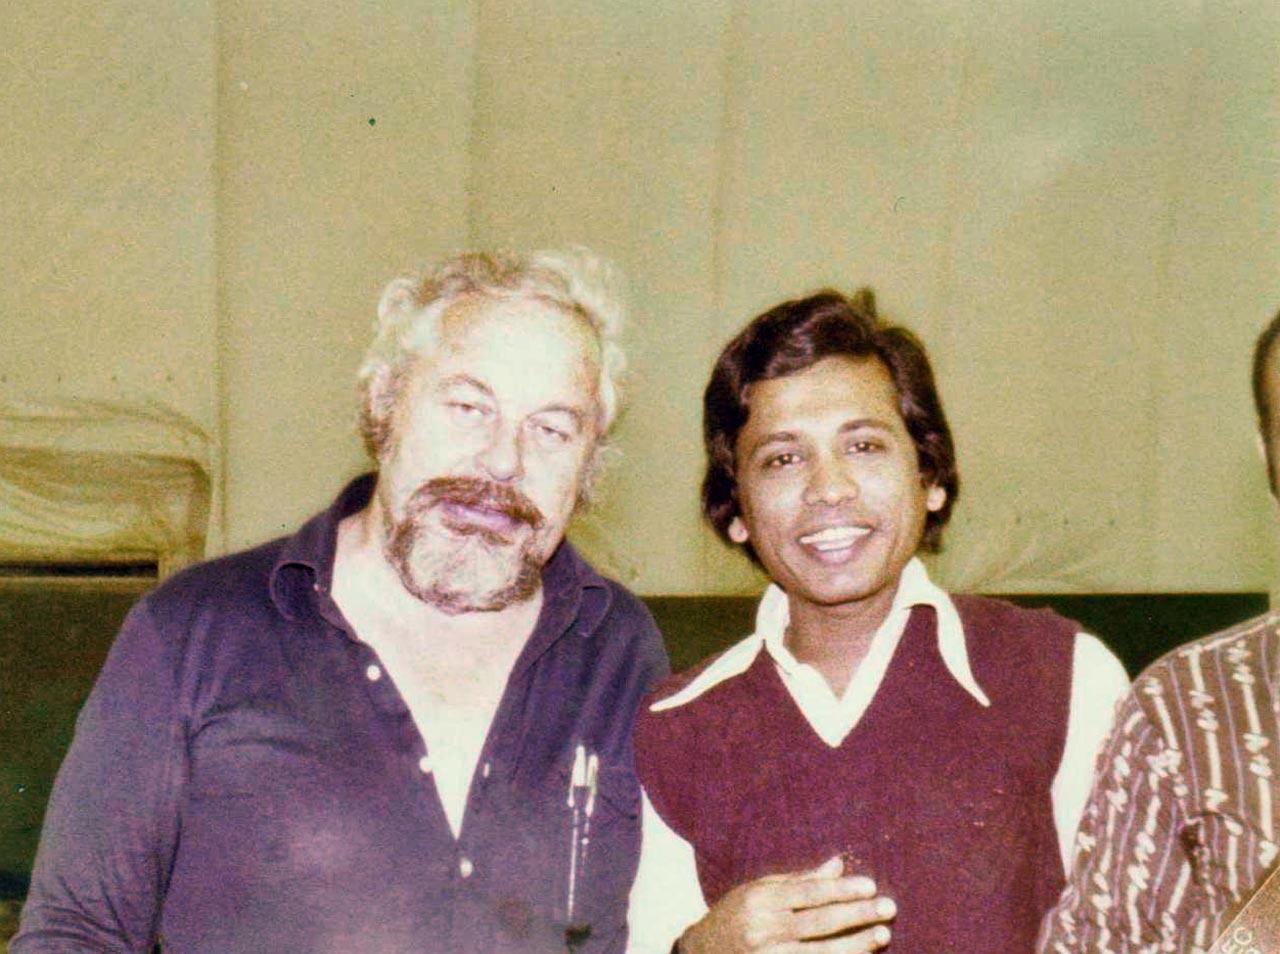 Alfred E. Sullivan and Mohammed Baig - 1982